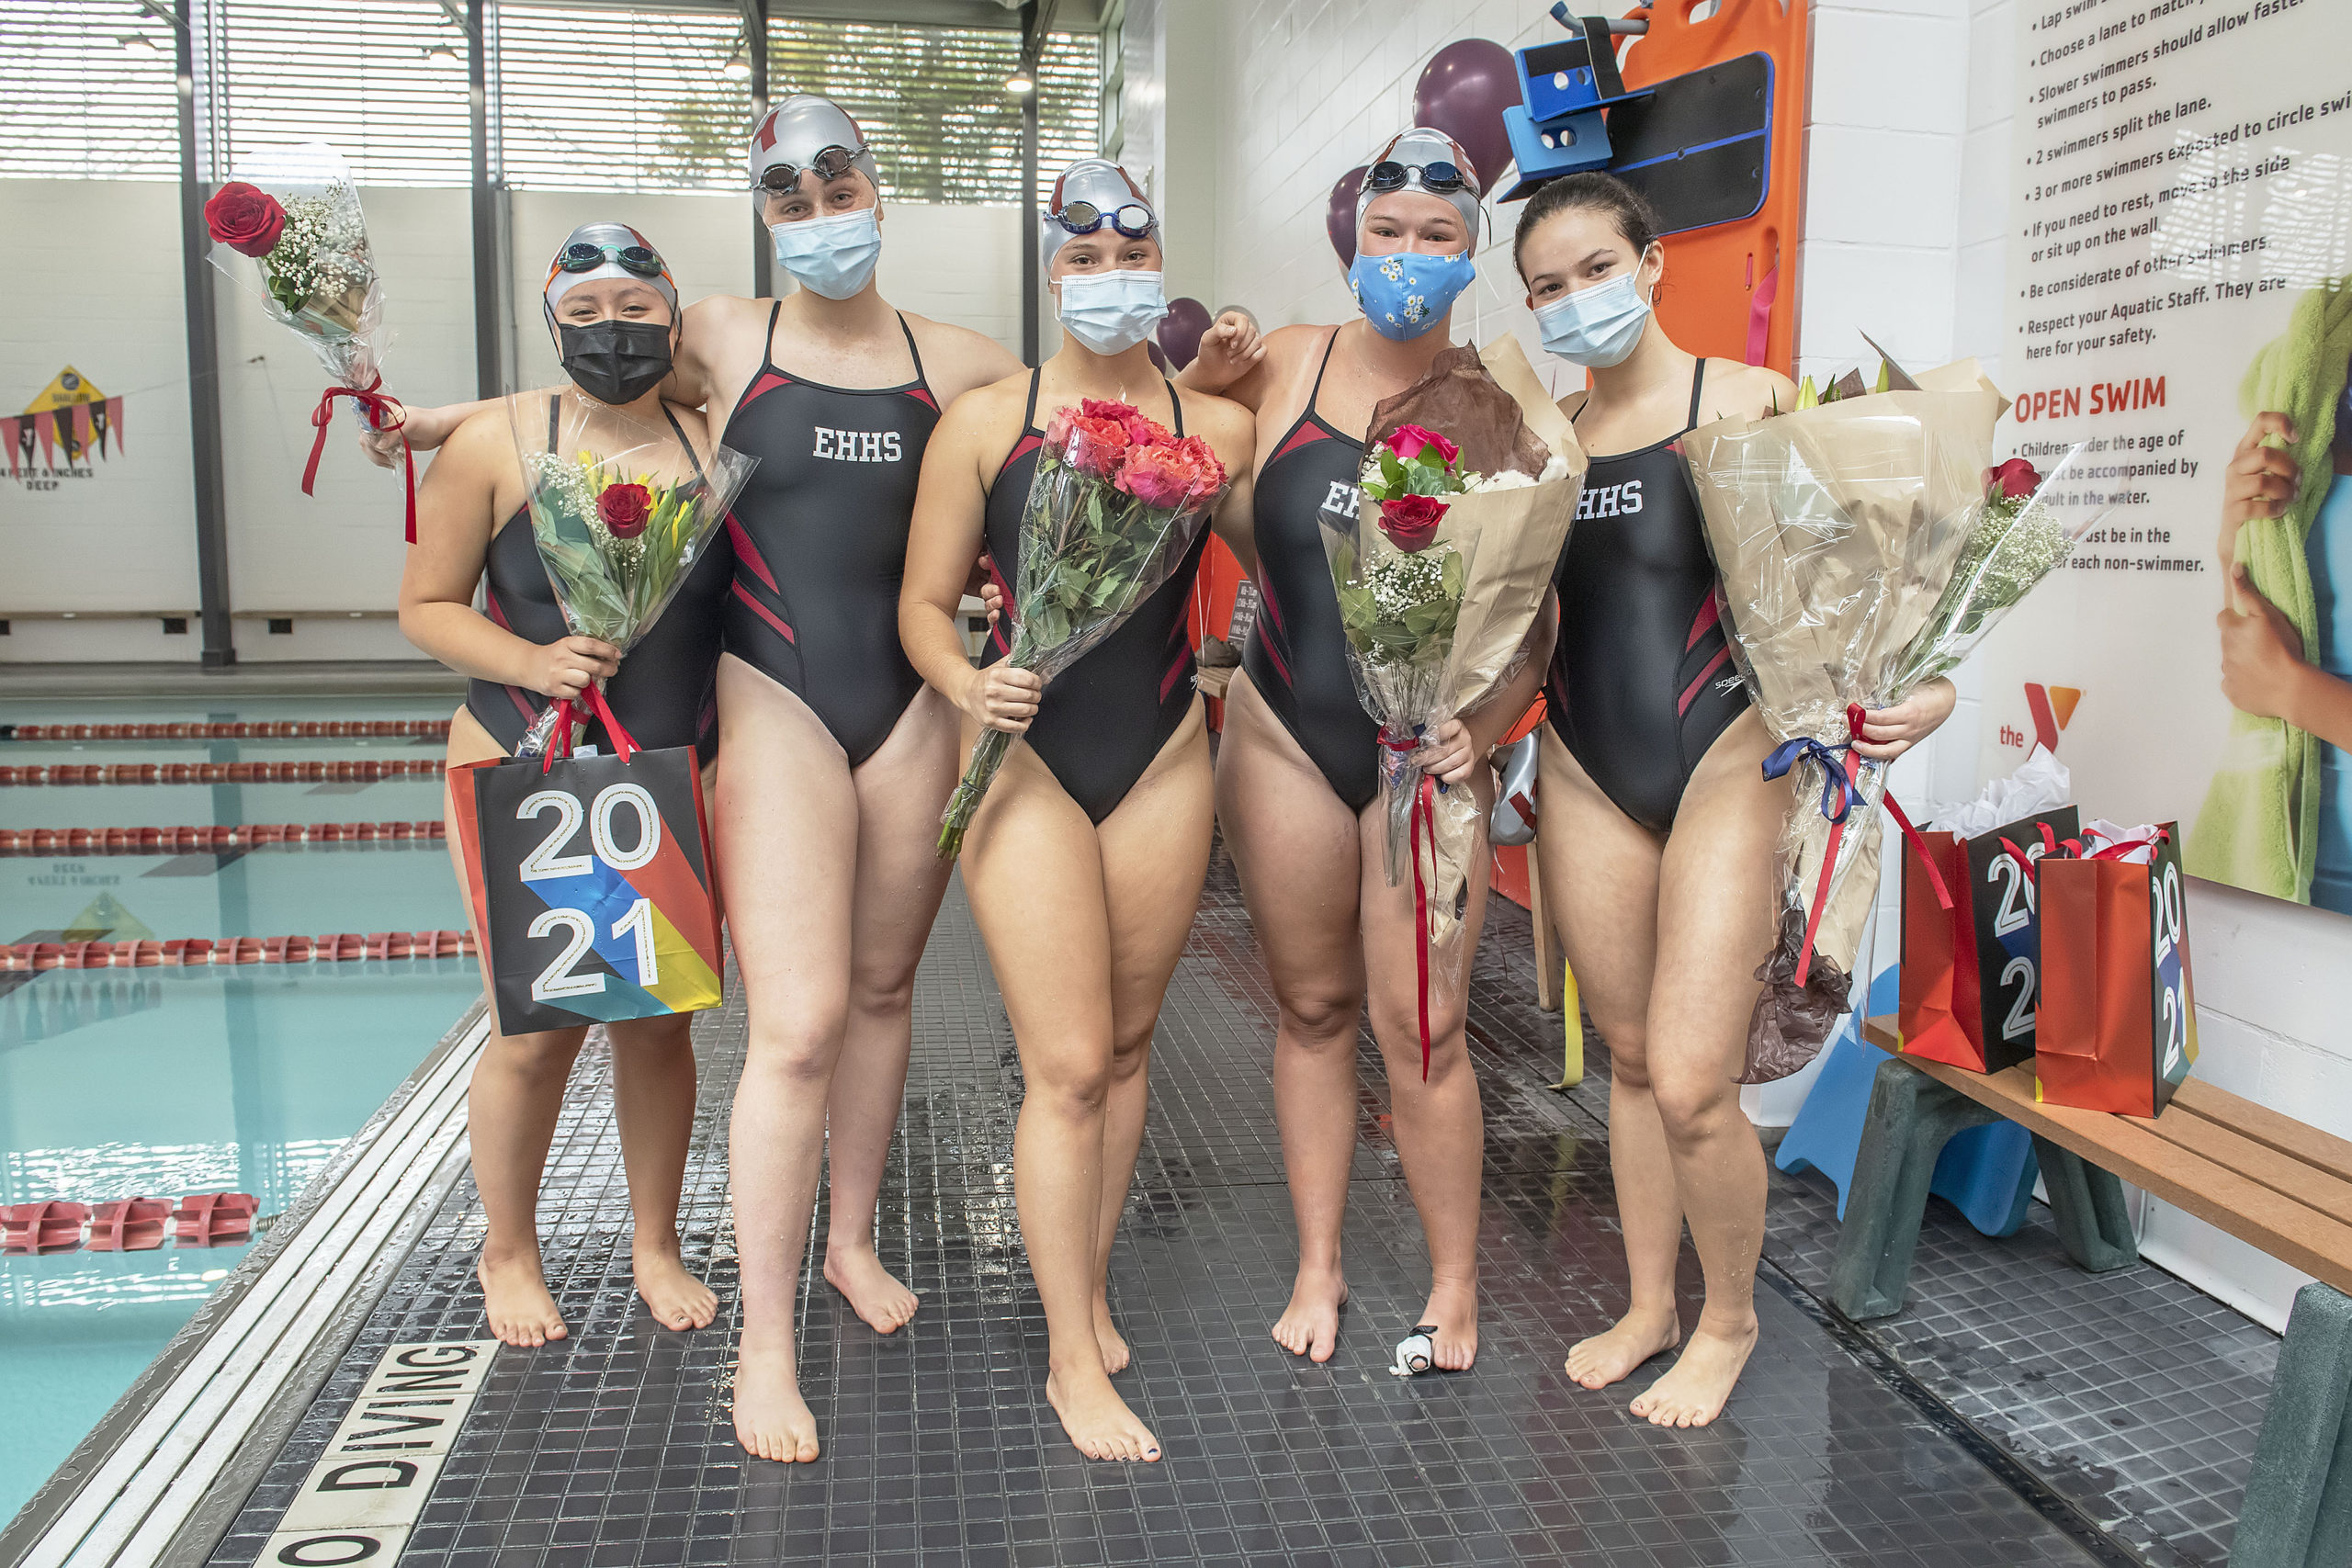 East Hampton-Pierson-Bridgehampton girls swim team seniors, from left, Stephanie Pallchisaca, Kiara Bailey-Williams, Catalina Badilla, Caroline Brown and Nicole Gutierrez.  MICHAEL HELLER